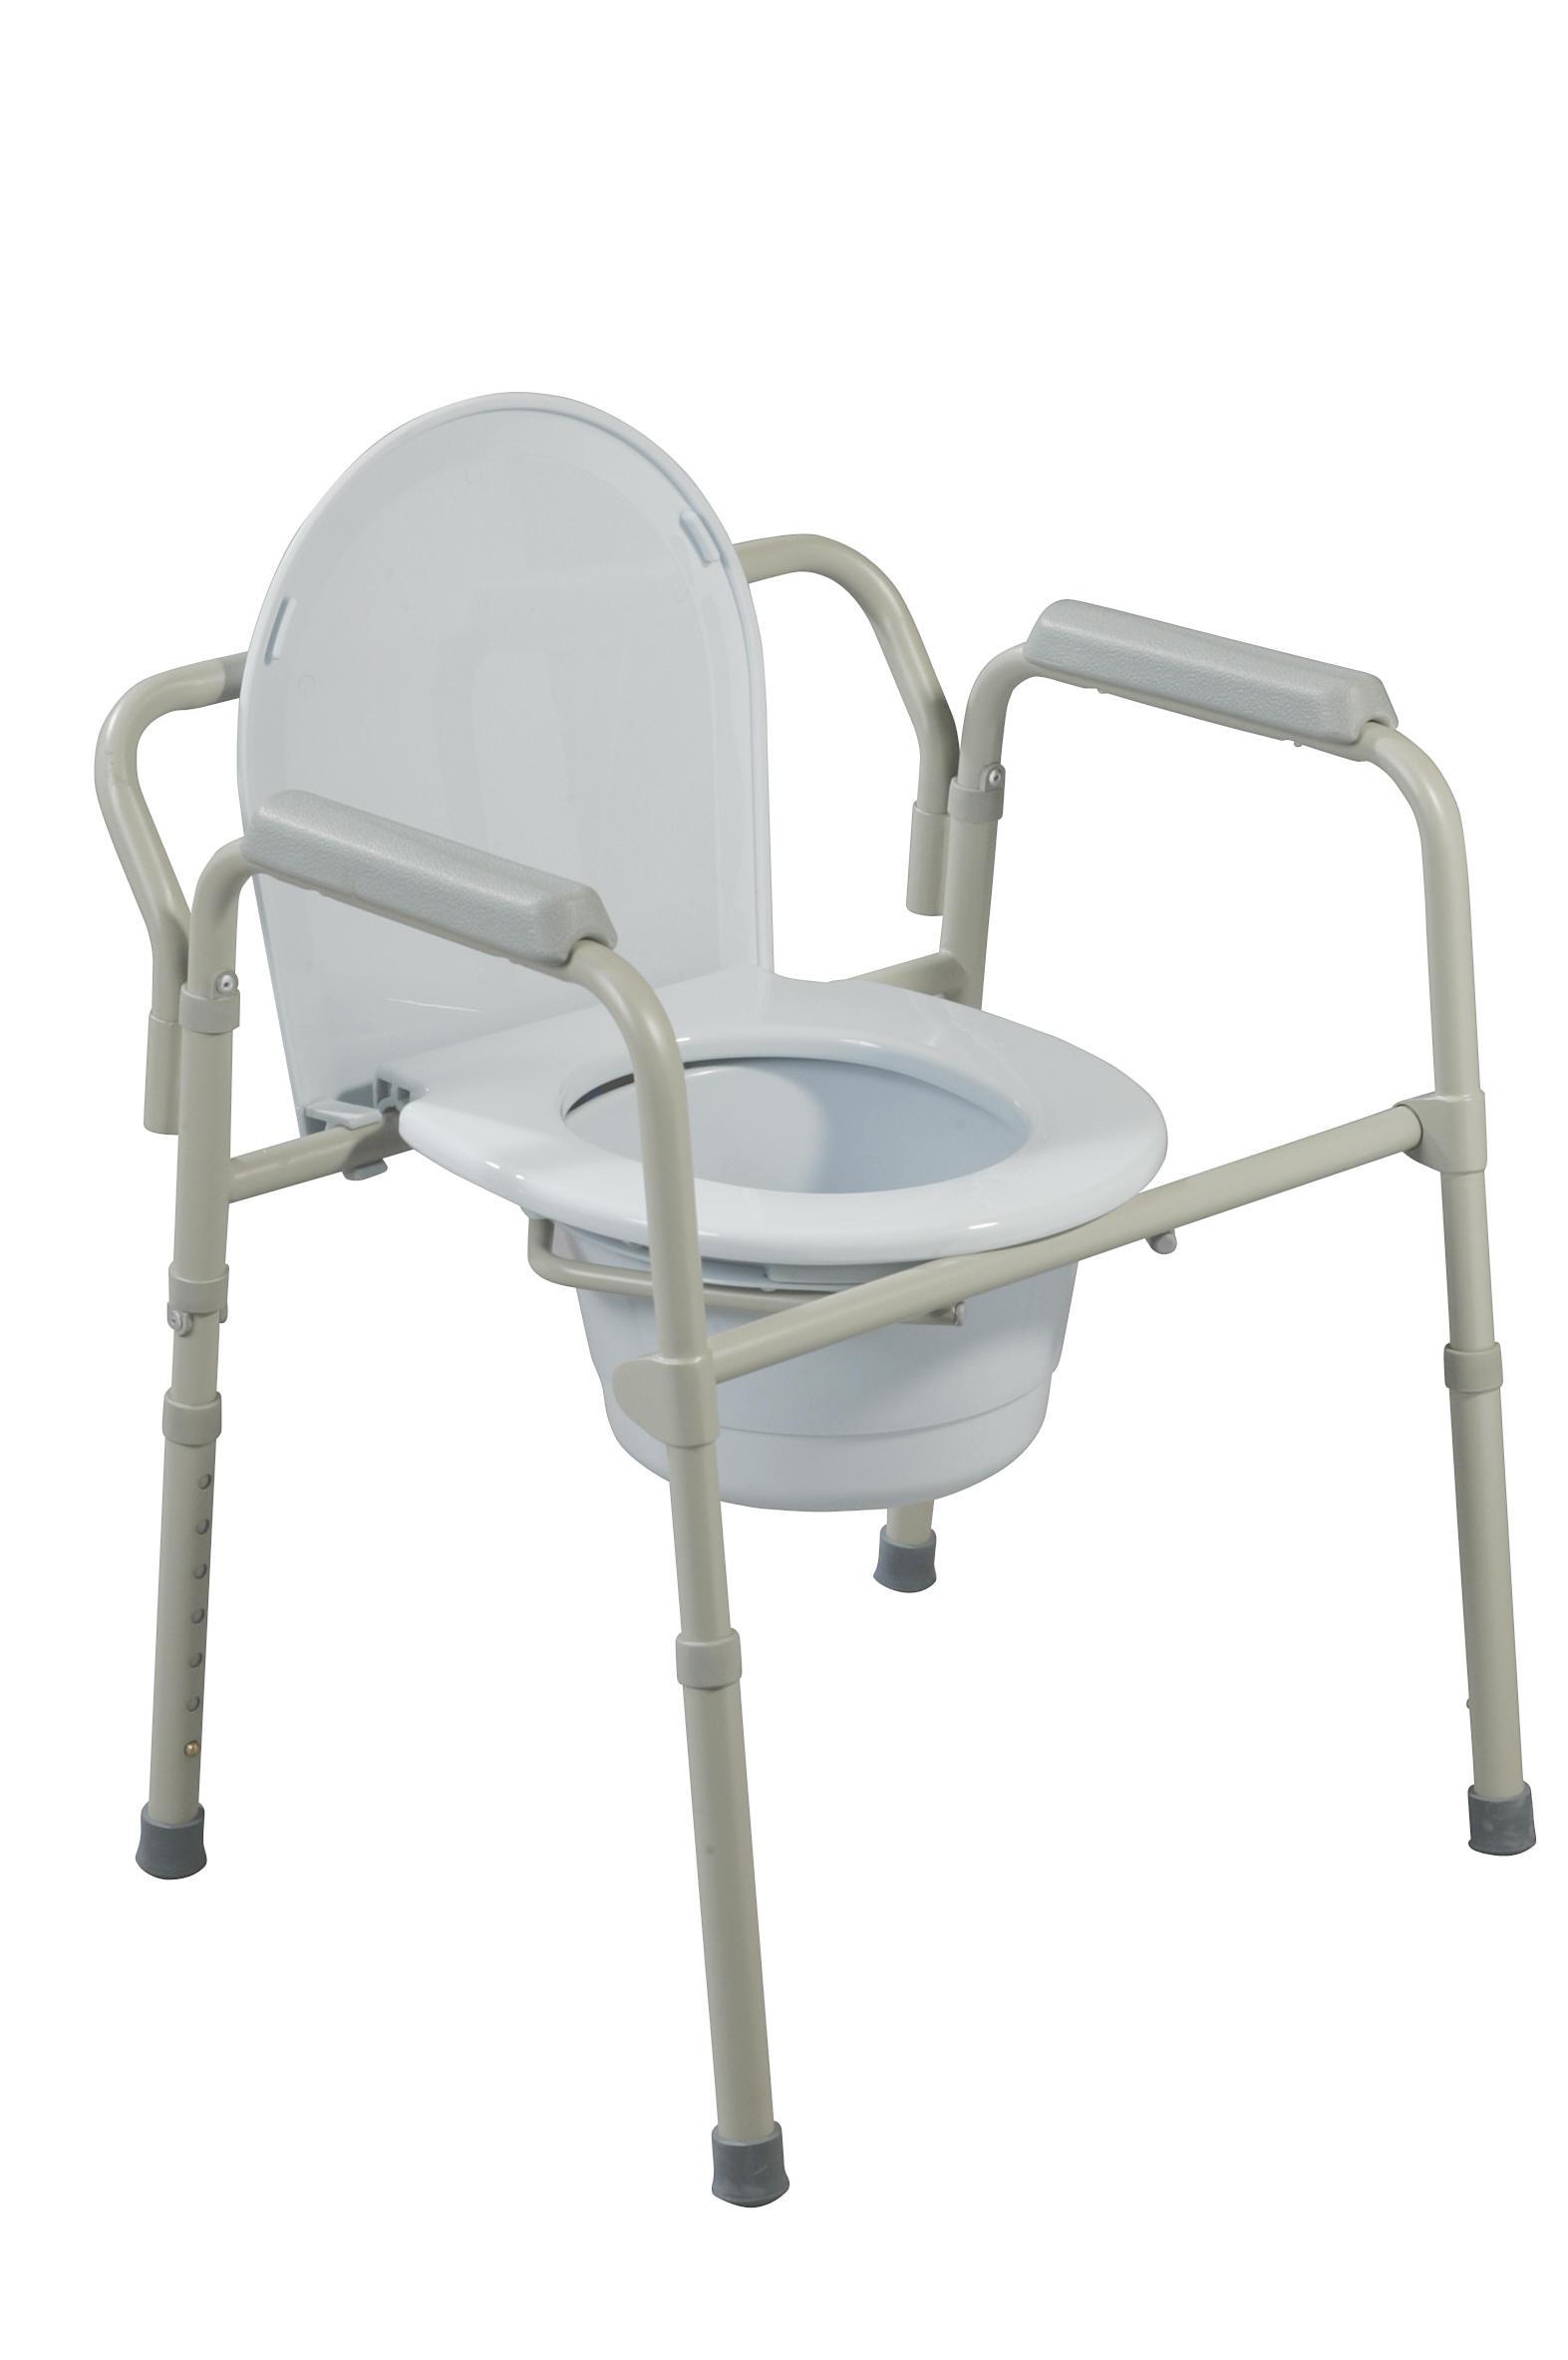 Bath Chair Bath Bench Shower Chair Tub Transfer Bench